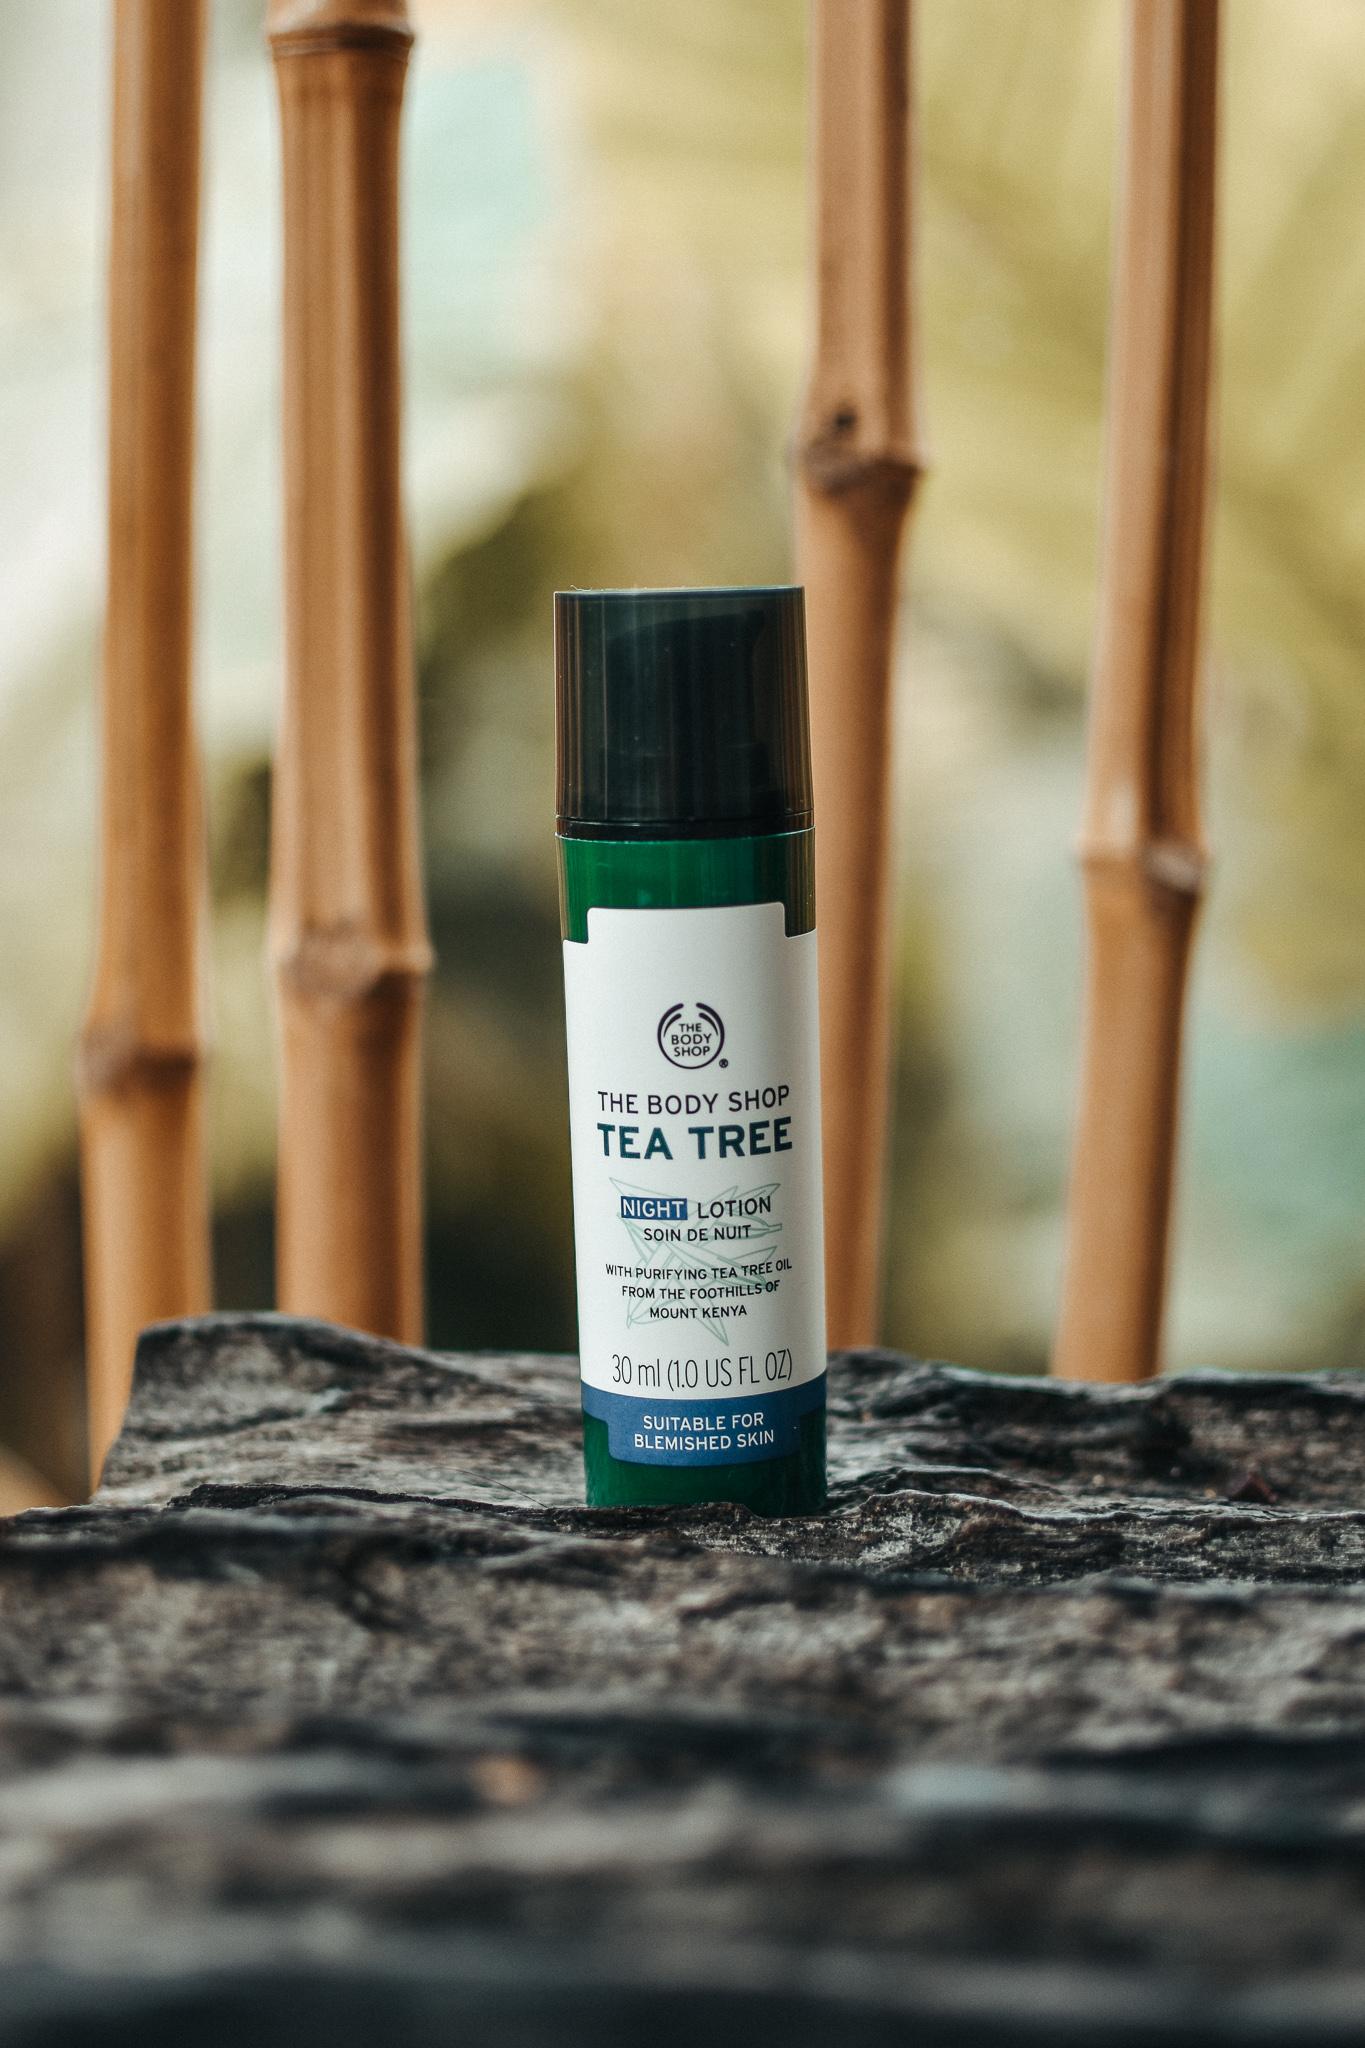 The Body Shop Tea Trea Oil Nighi